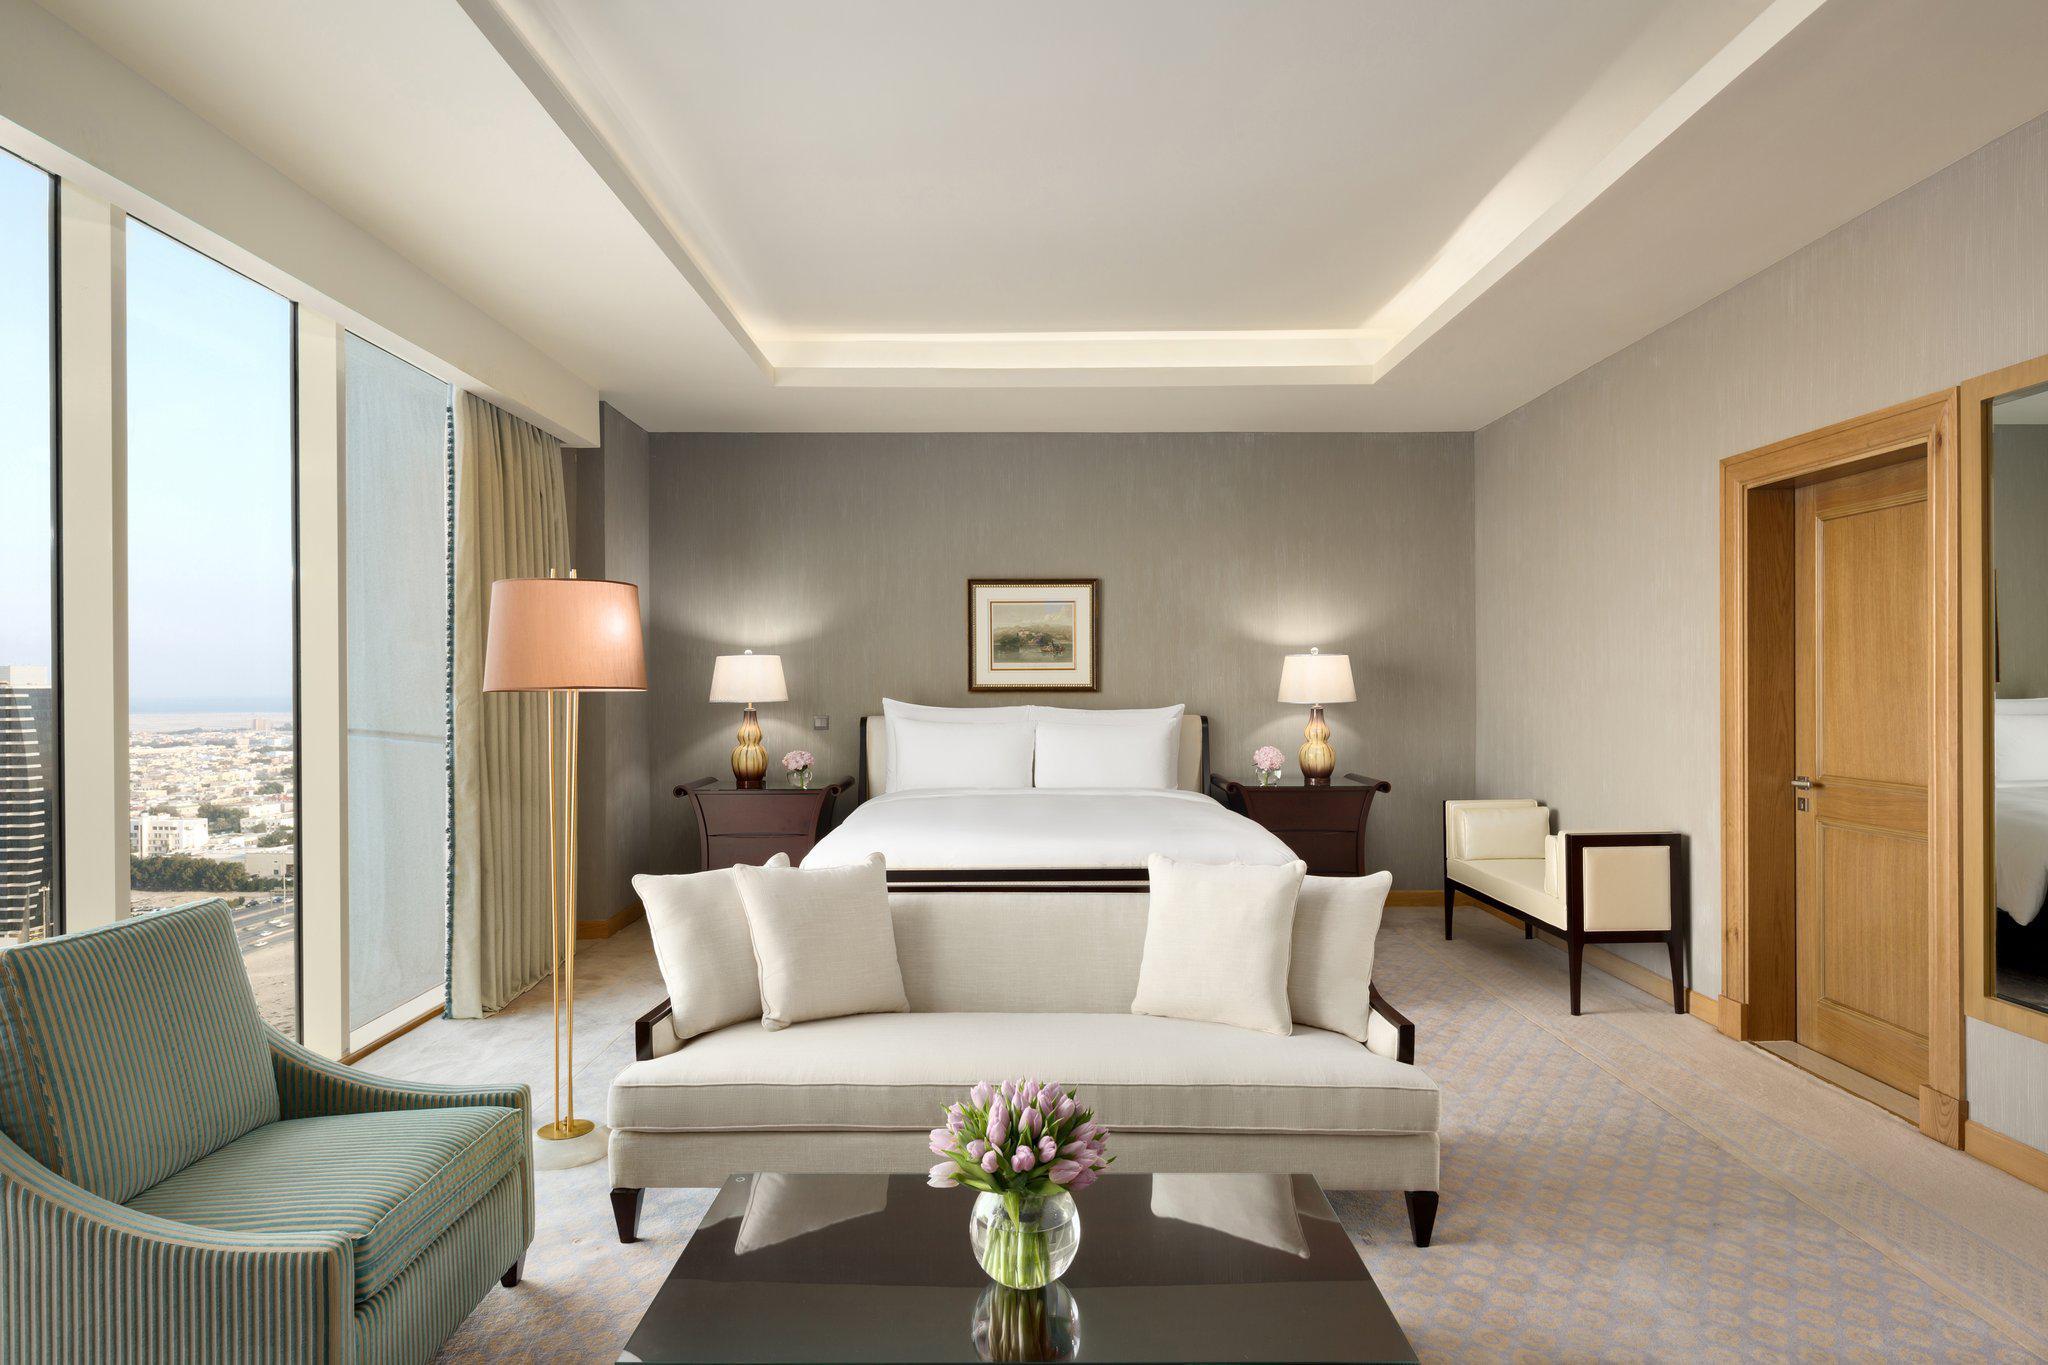 Kempinski Al Othman Hotel Al Khobar, Dammam Hotels - Skyscanner